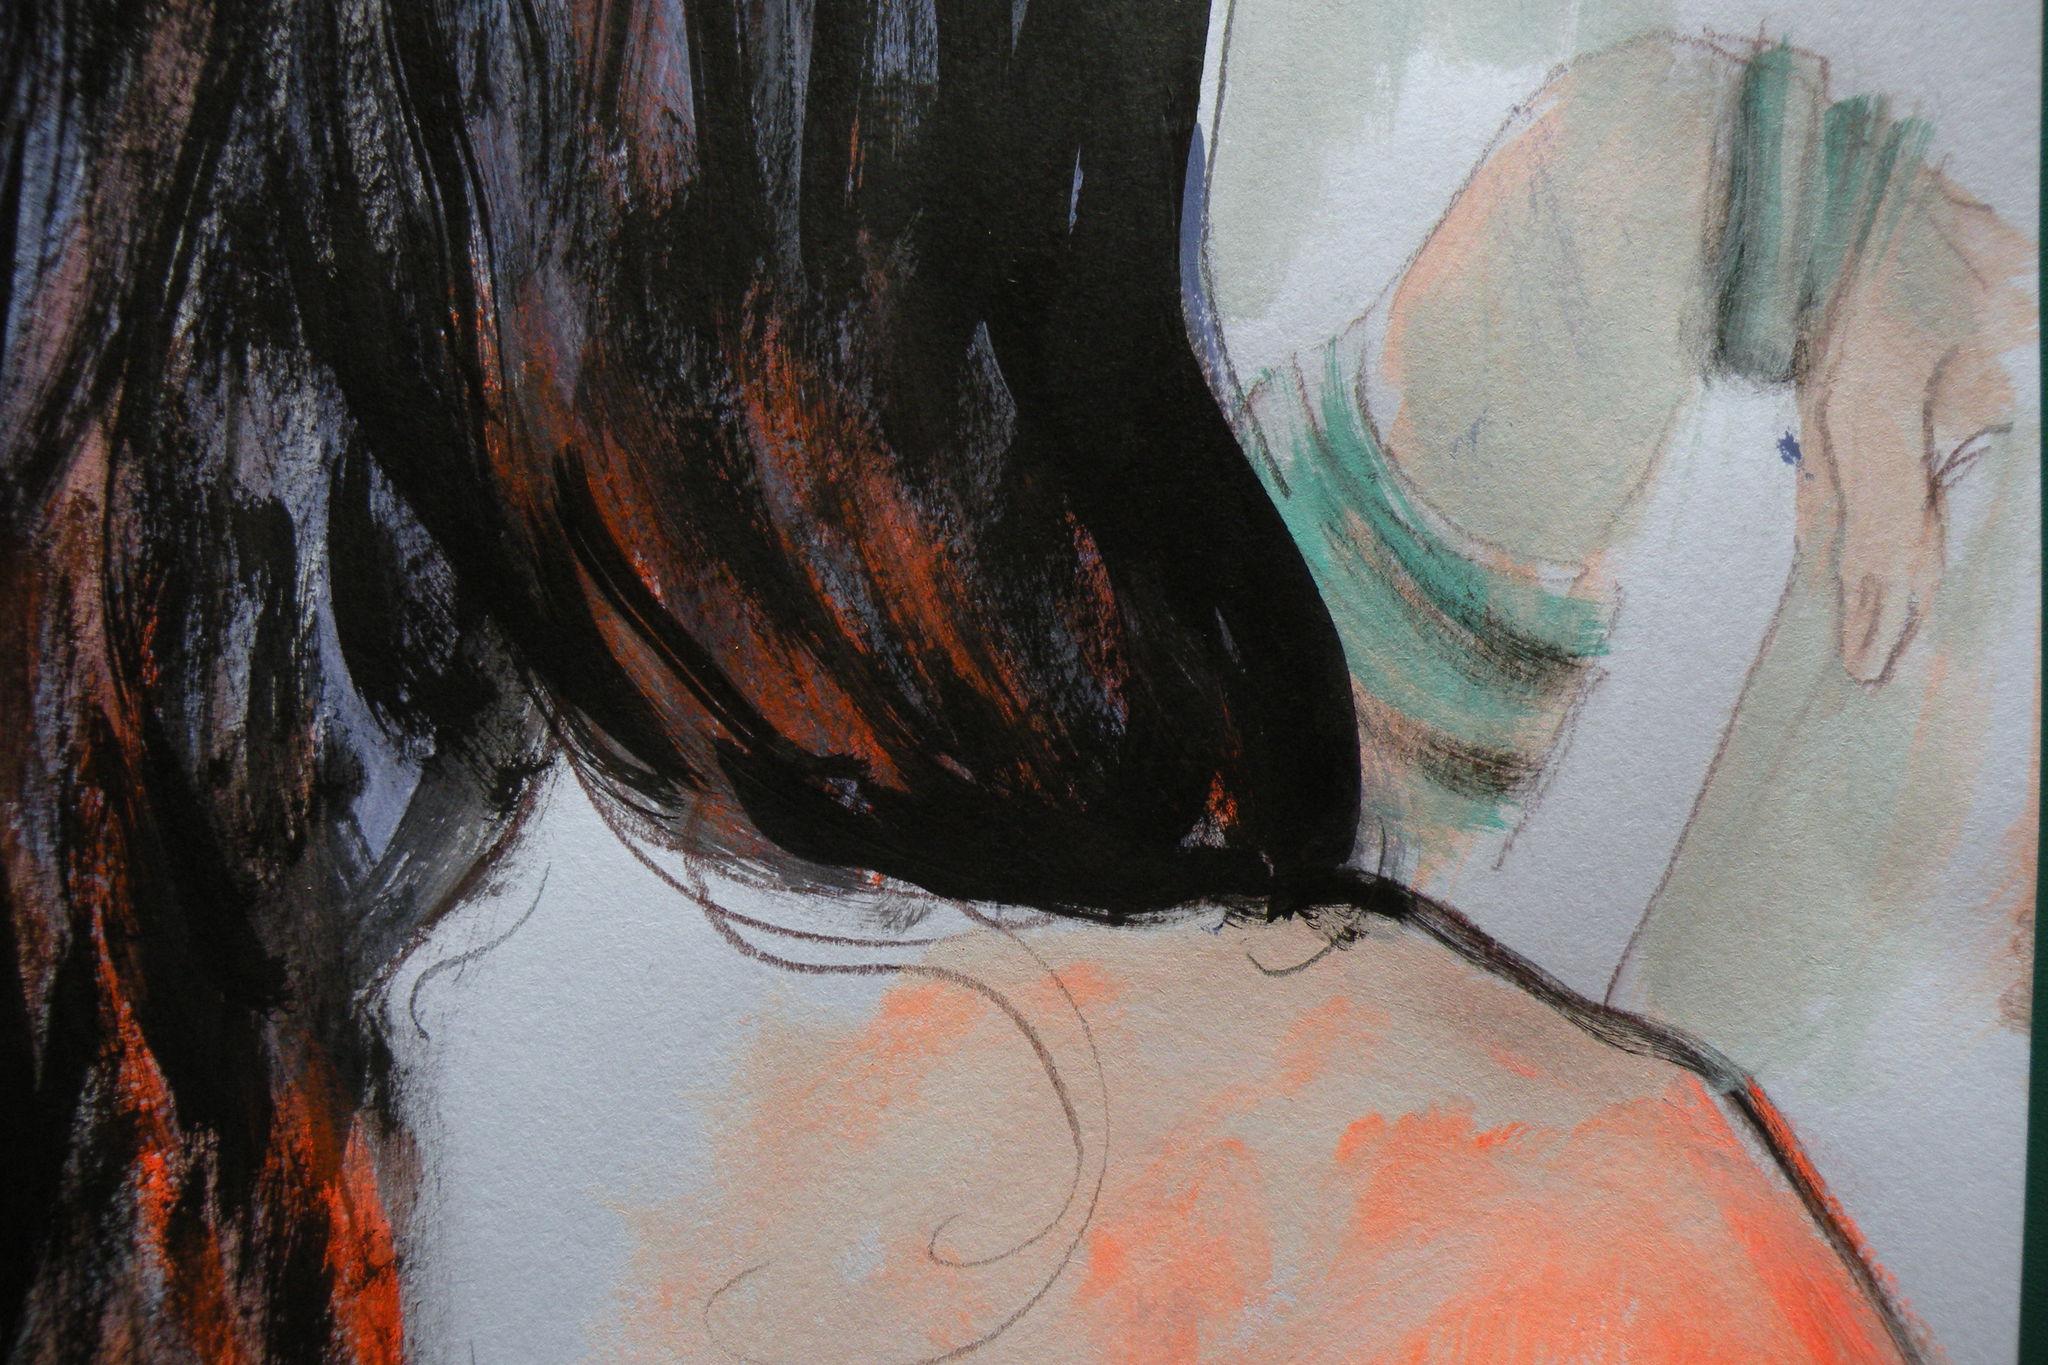 dessin de nus alain montoir (16)